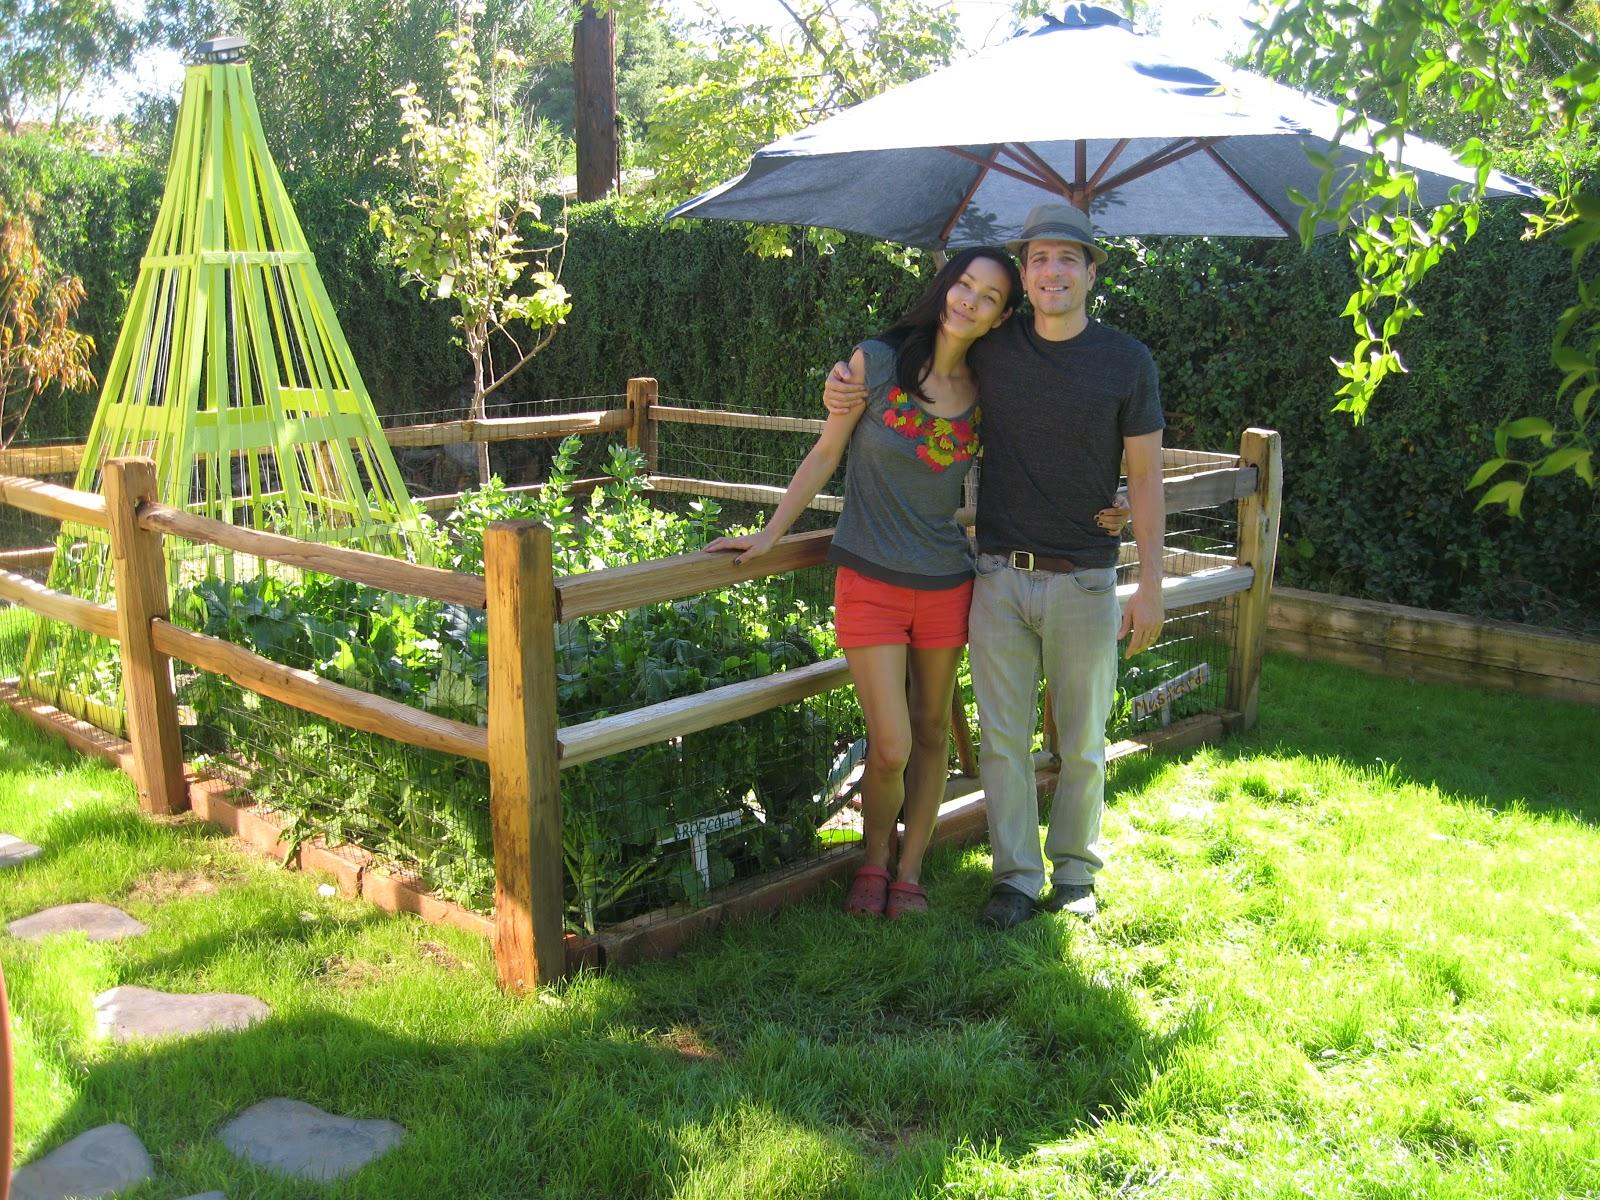 A Closer Look Inside Their Fenced Garden.